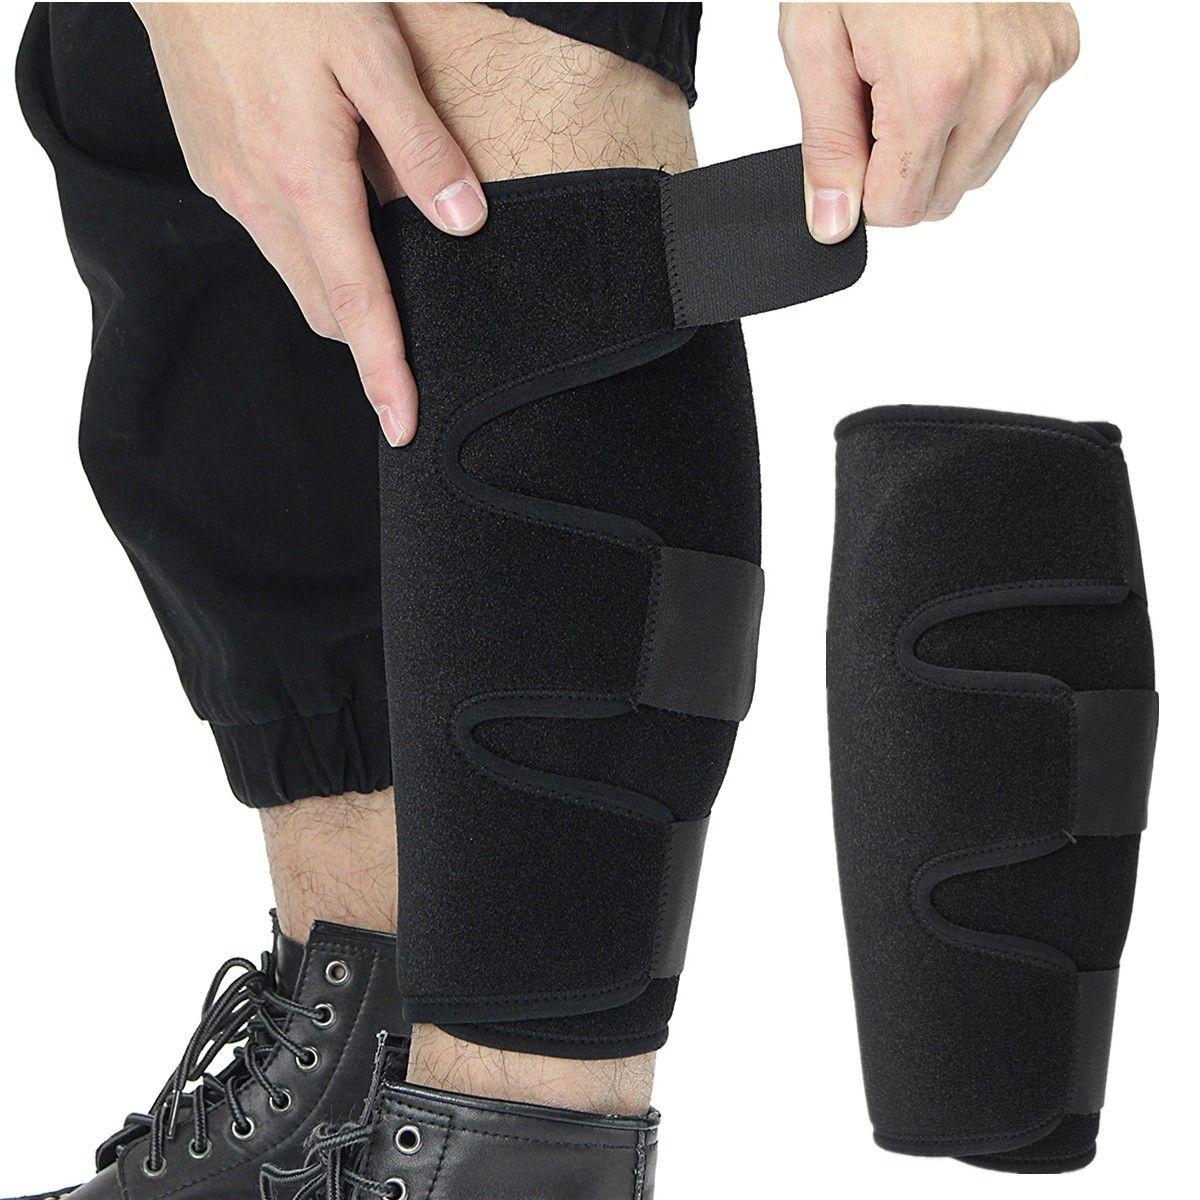 eaabcca1e5 Calf Compression Brace Shin Splint Sleeve Support Lower Leg Wrap Muscle  Pain Relief